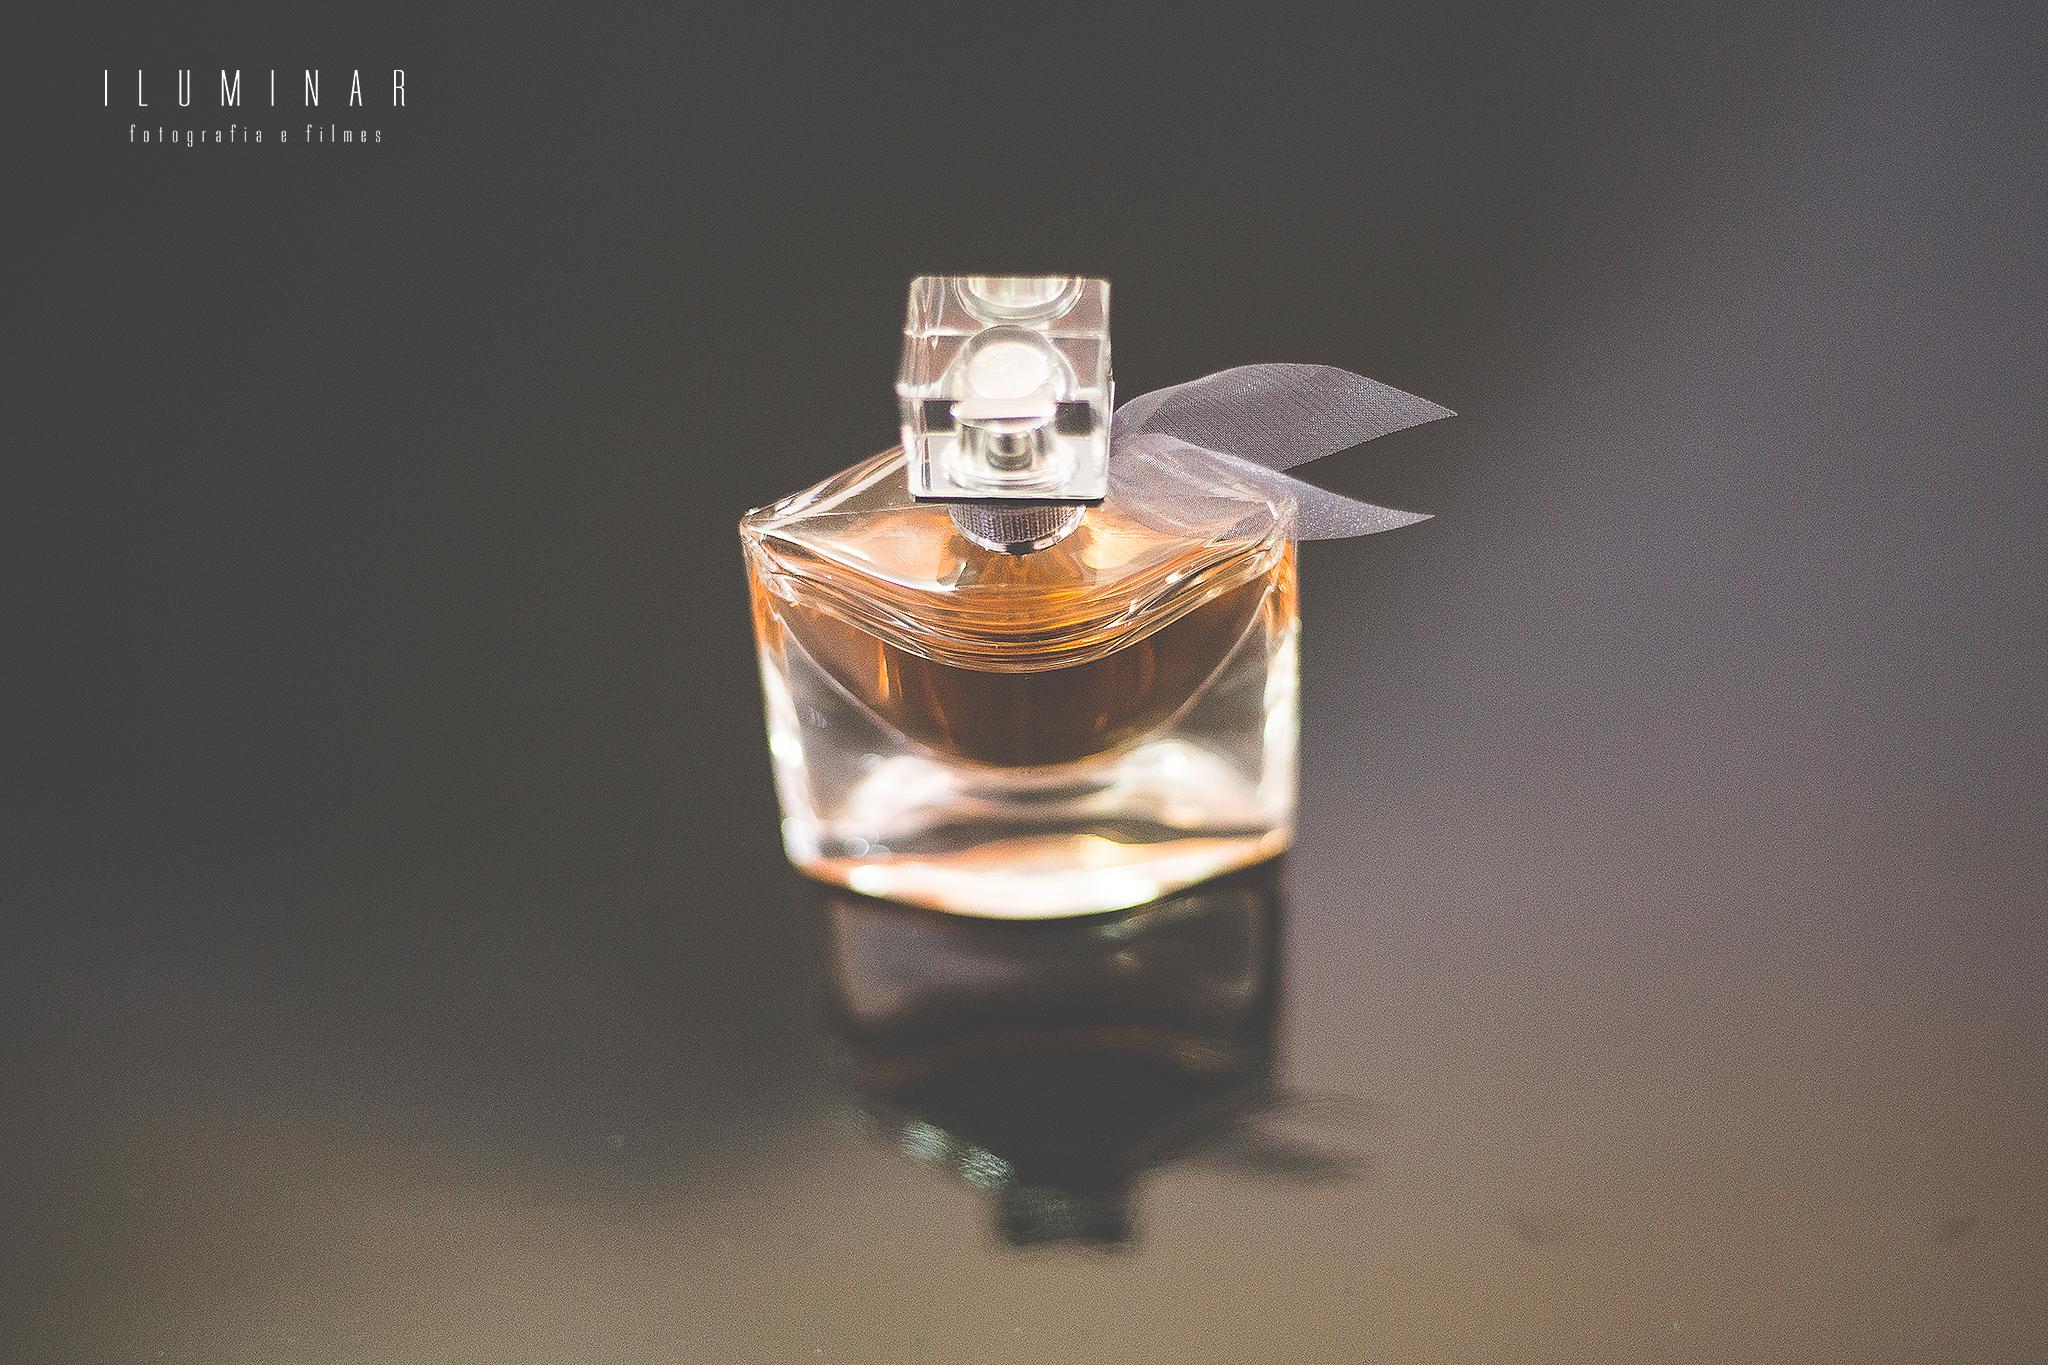 Dia da Noiva - Perfume da Noiva